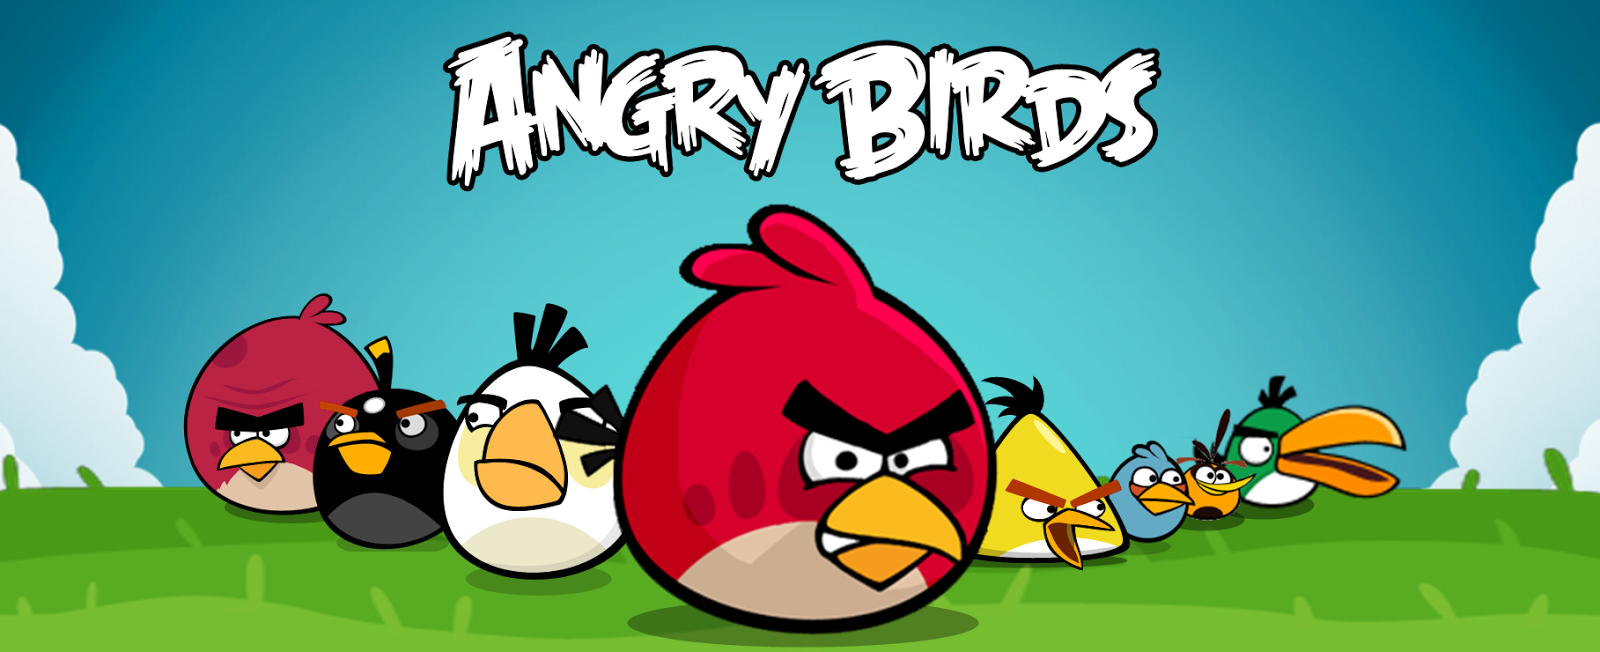 Angrybirds Francescanatale 05: Web Dev .NET: Angry Birds Of JavaScript: Green Bird